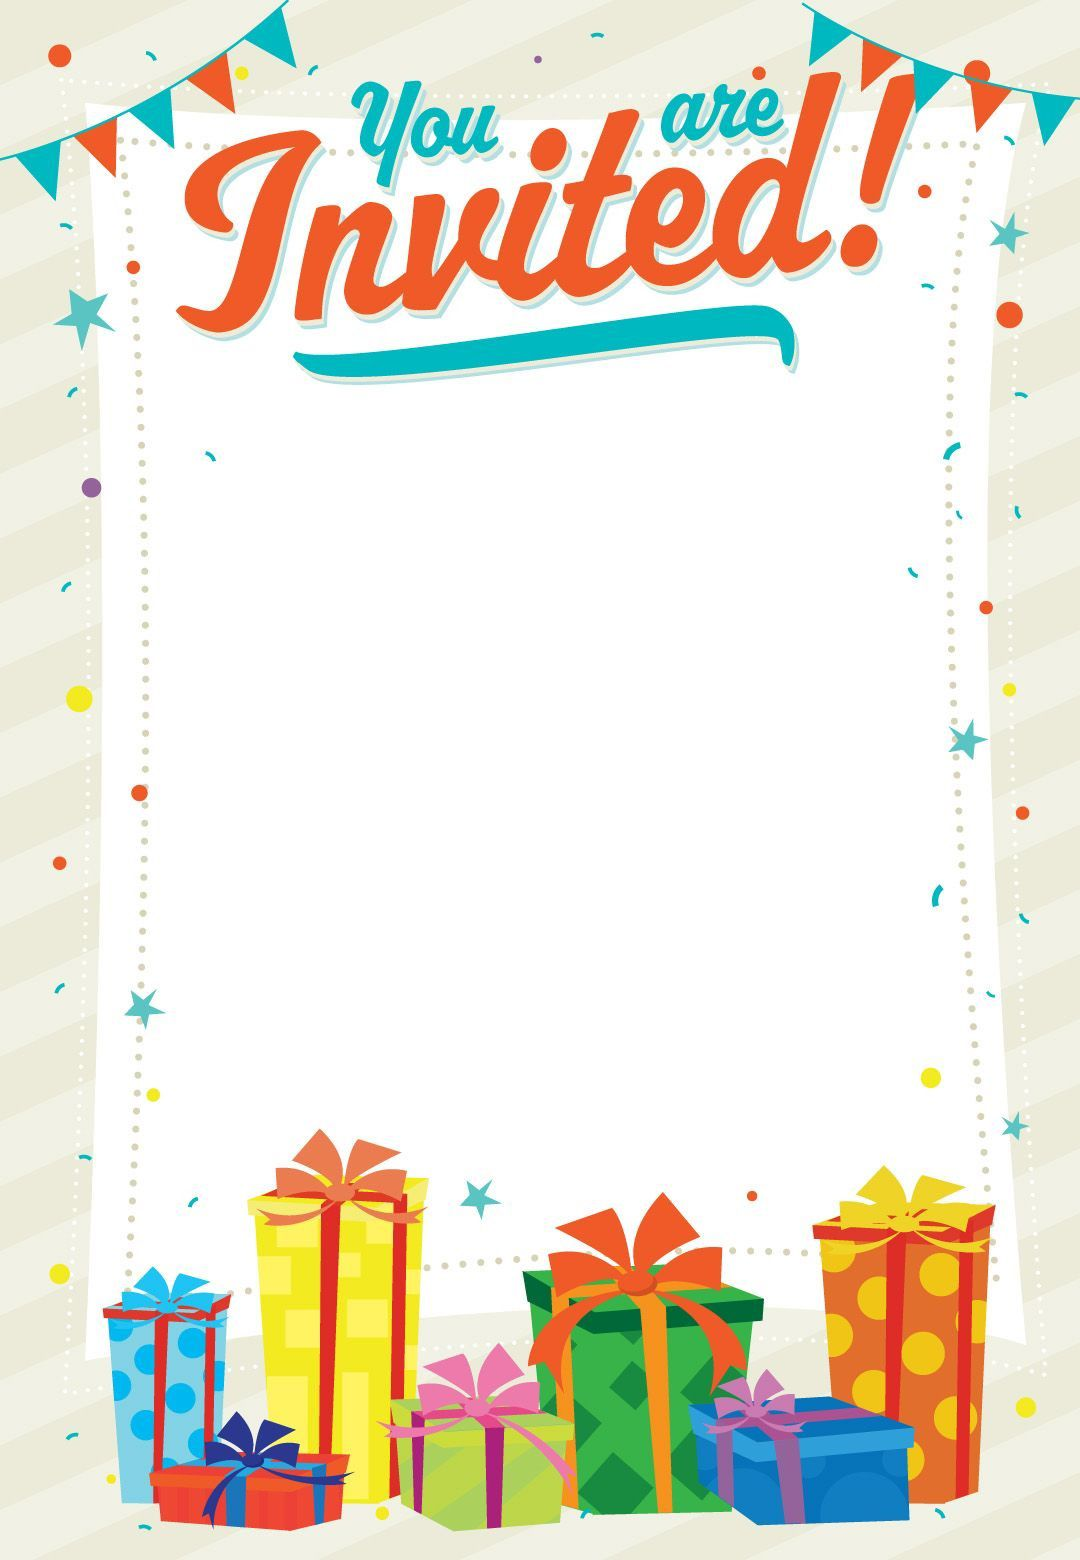 003 Imposing Free Online Printable Birthday Invitation Template Inspiration  Templates Card MakerFull